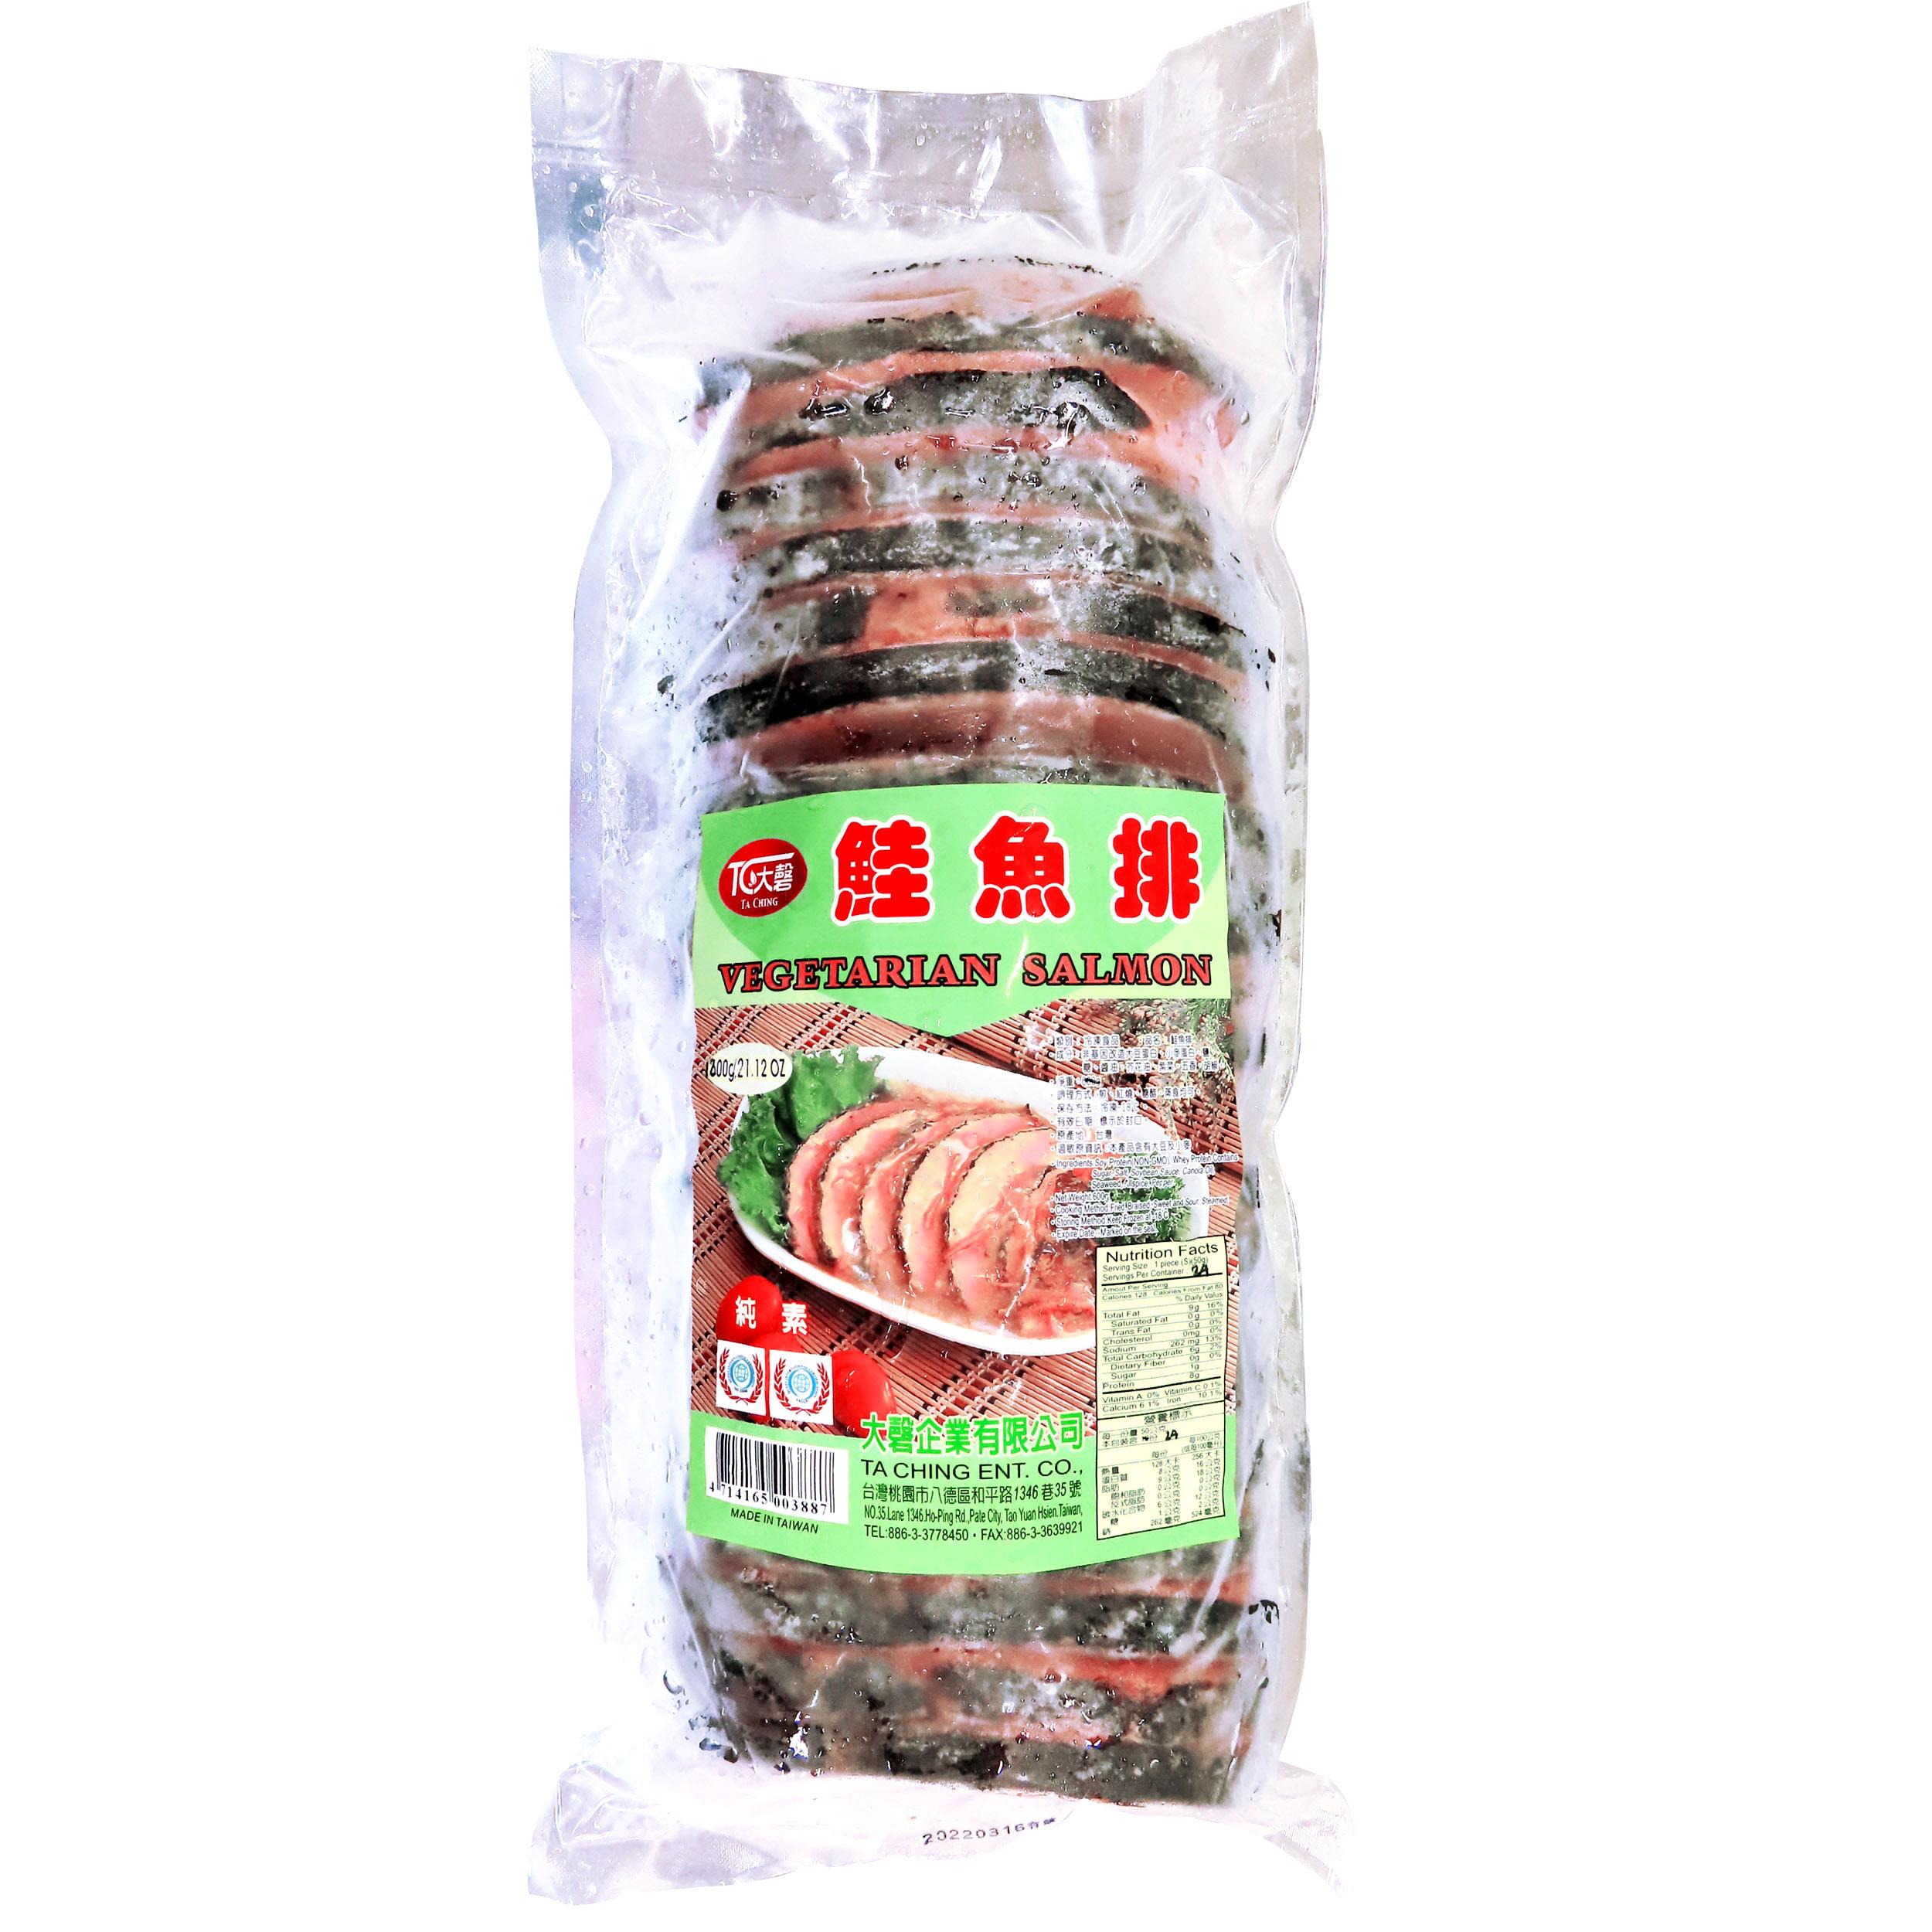 Image Salmon (Vegetarian) 大馨-鲑鱼排 1000grams